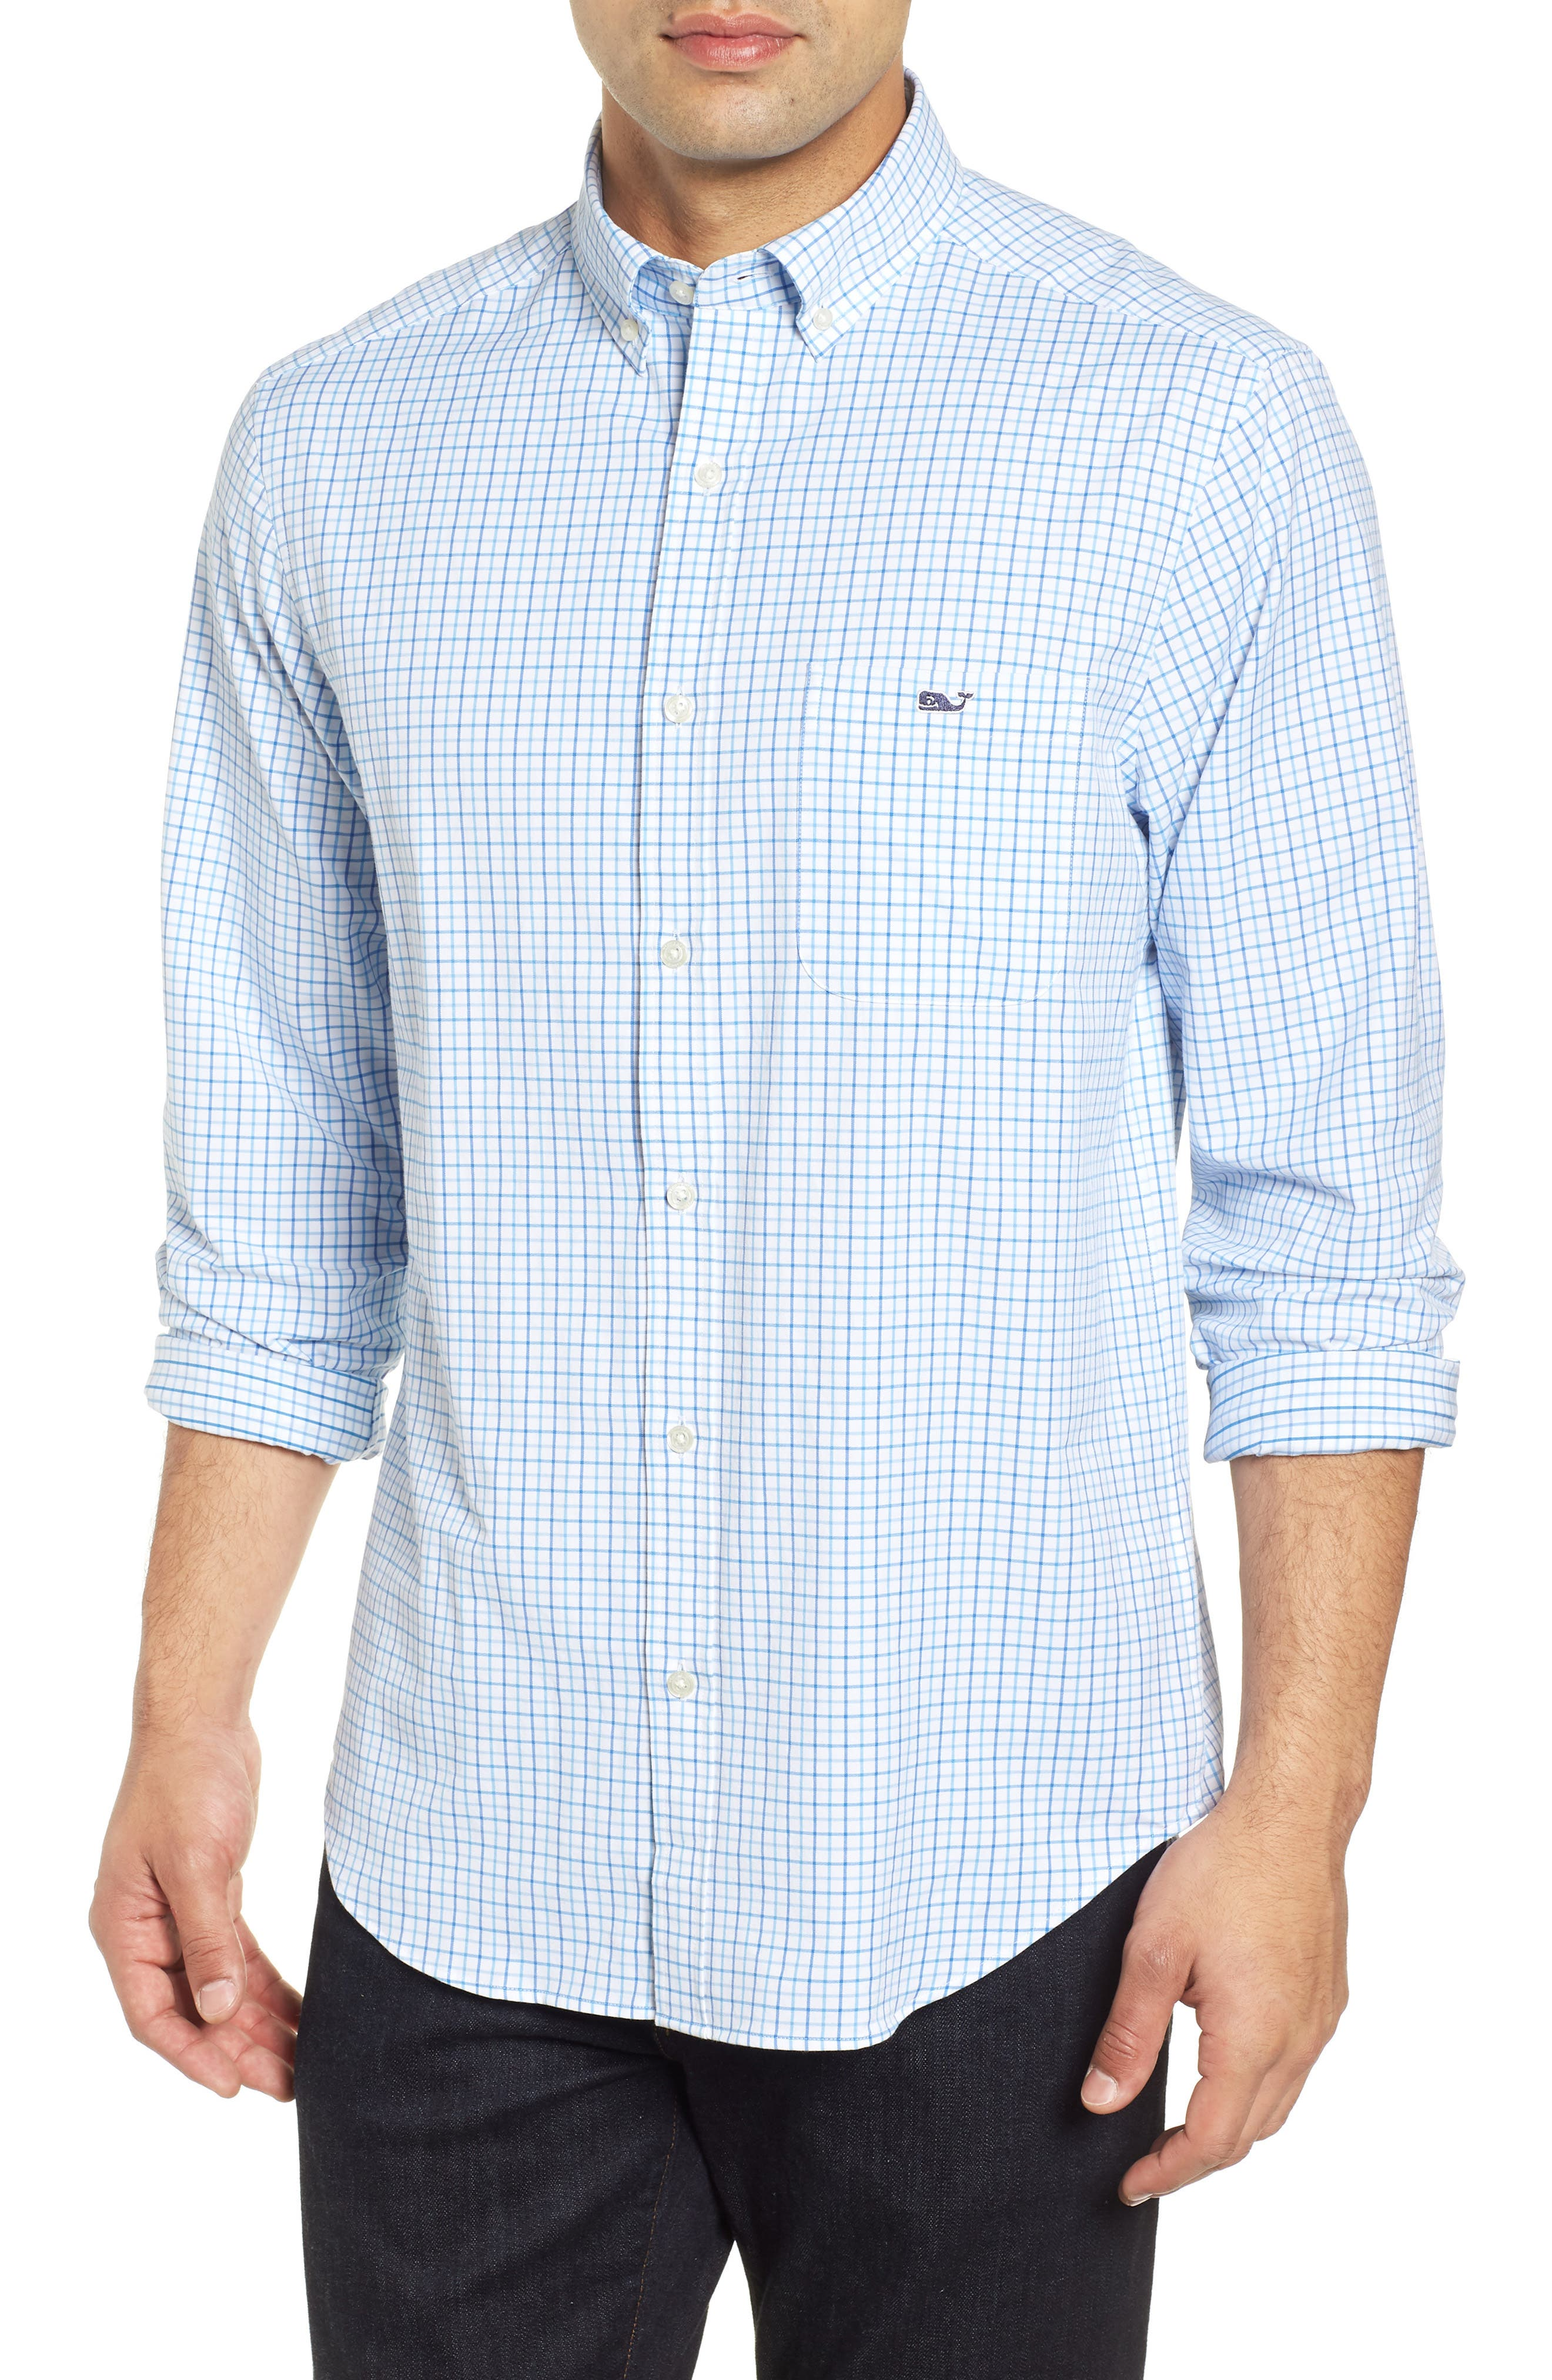 Pepperbush Regular Fit Plaid Sport Shirt,                         Main,                         color, 427